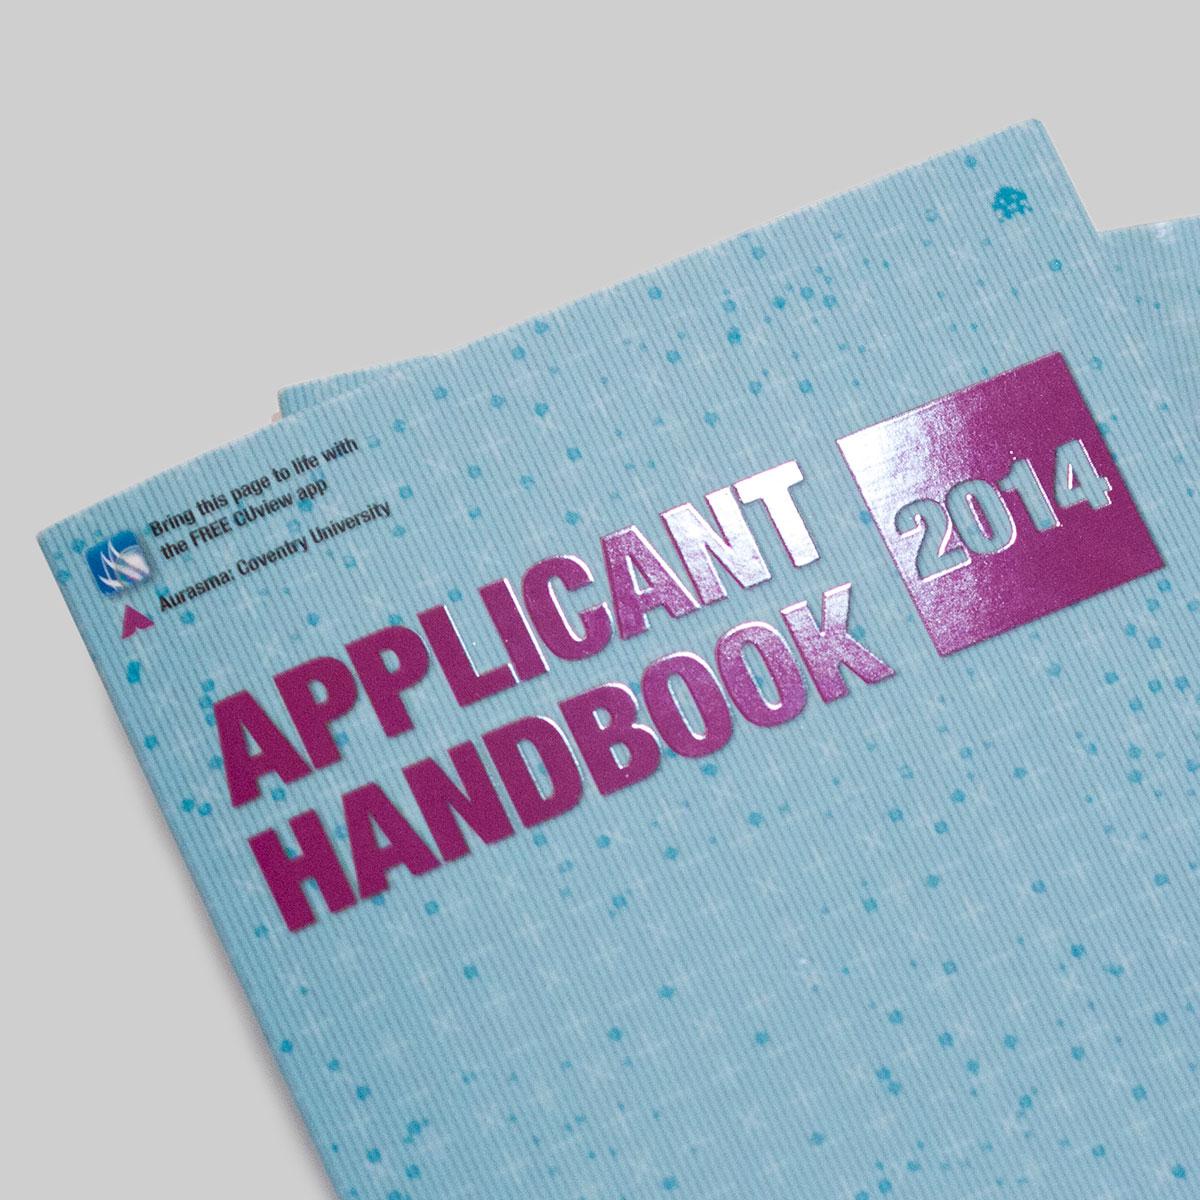 Applicant Handbook